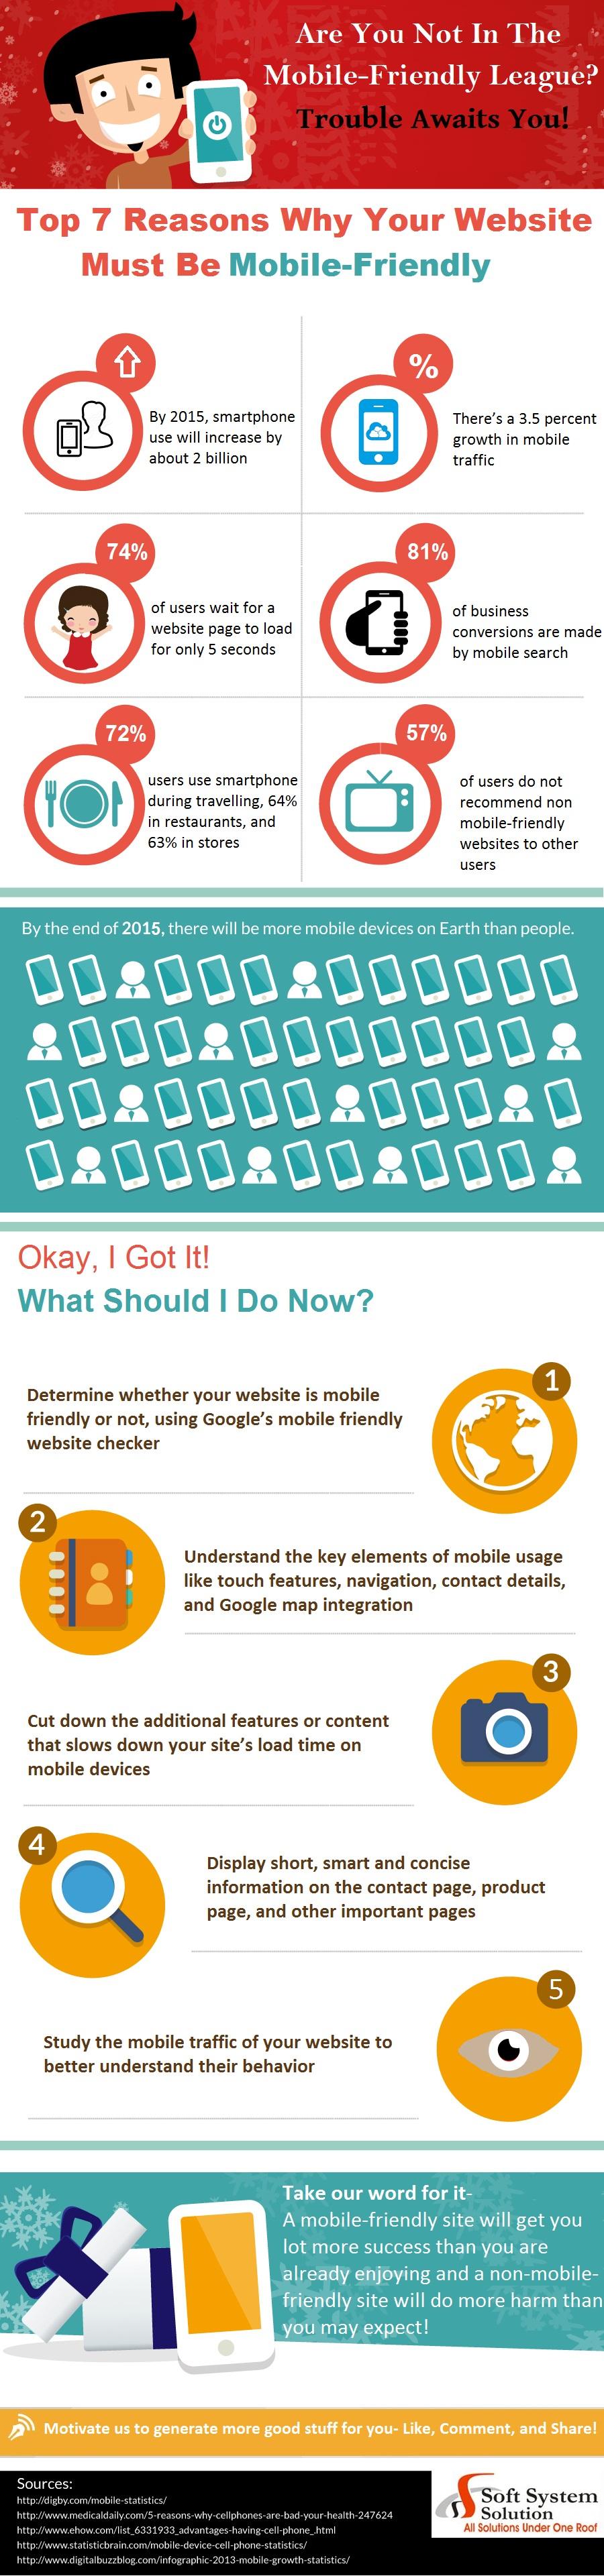 Tips for Mobile Friendly Website